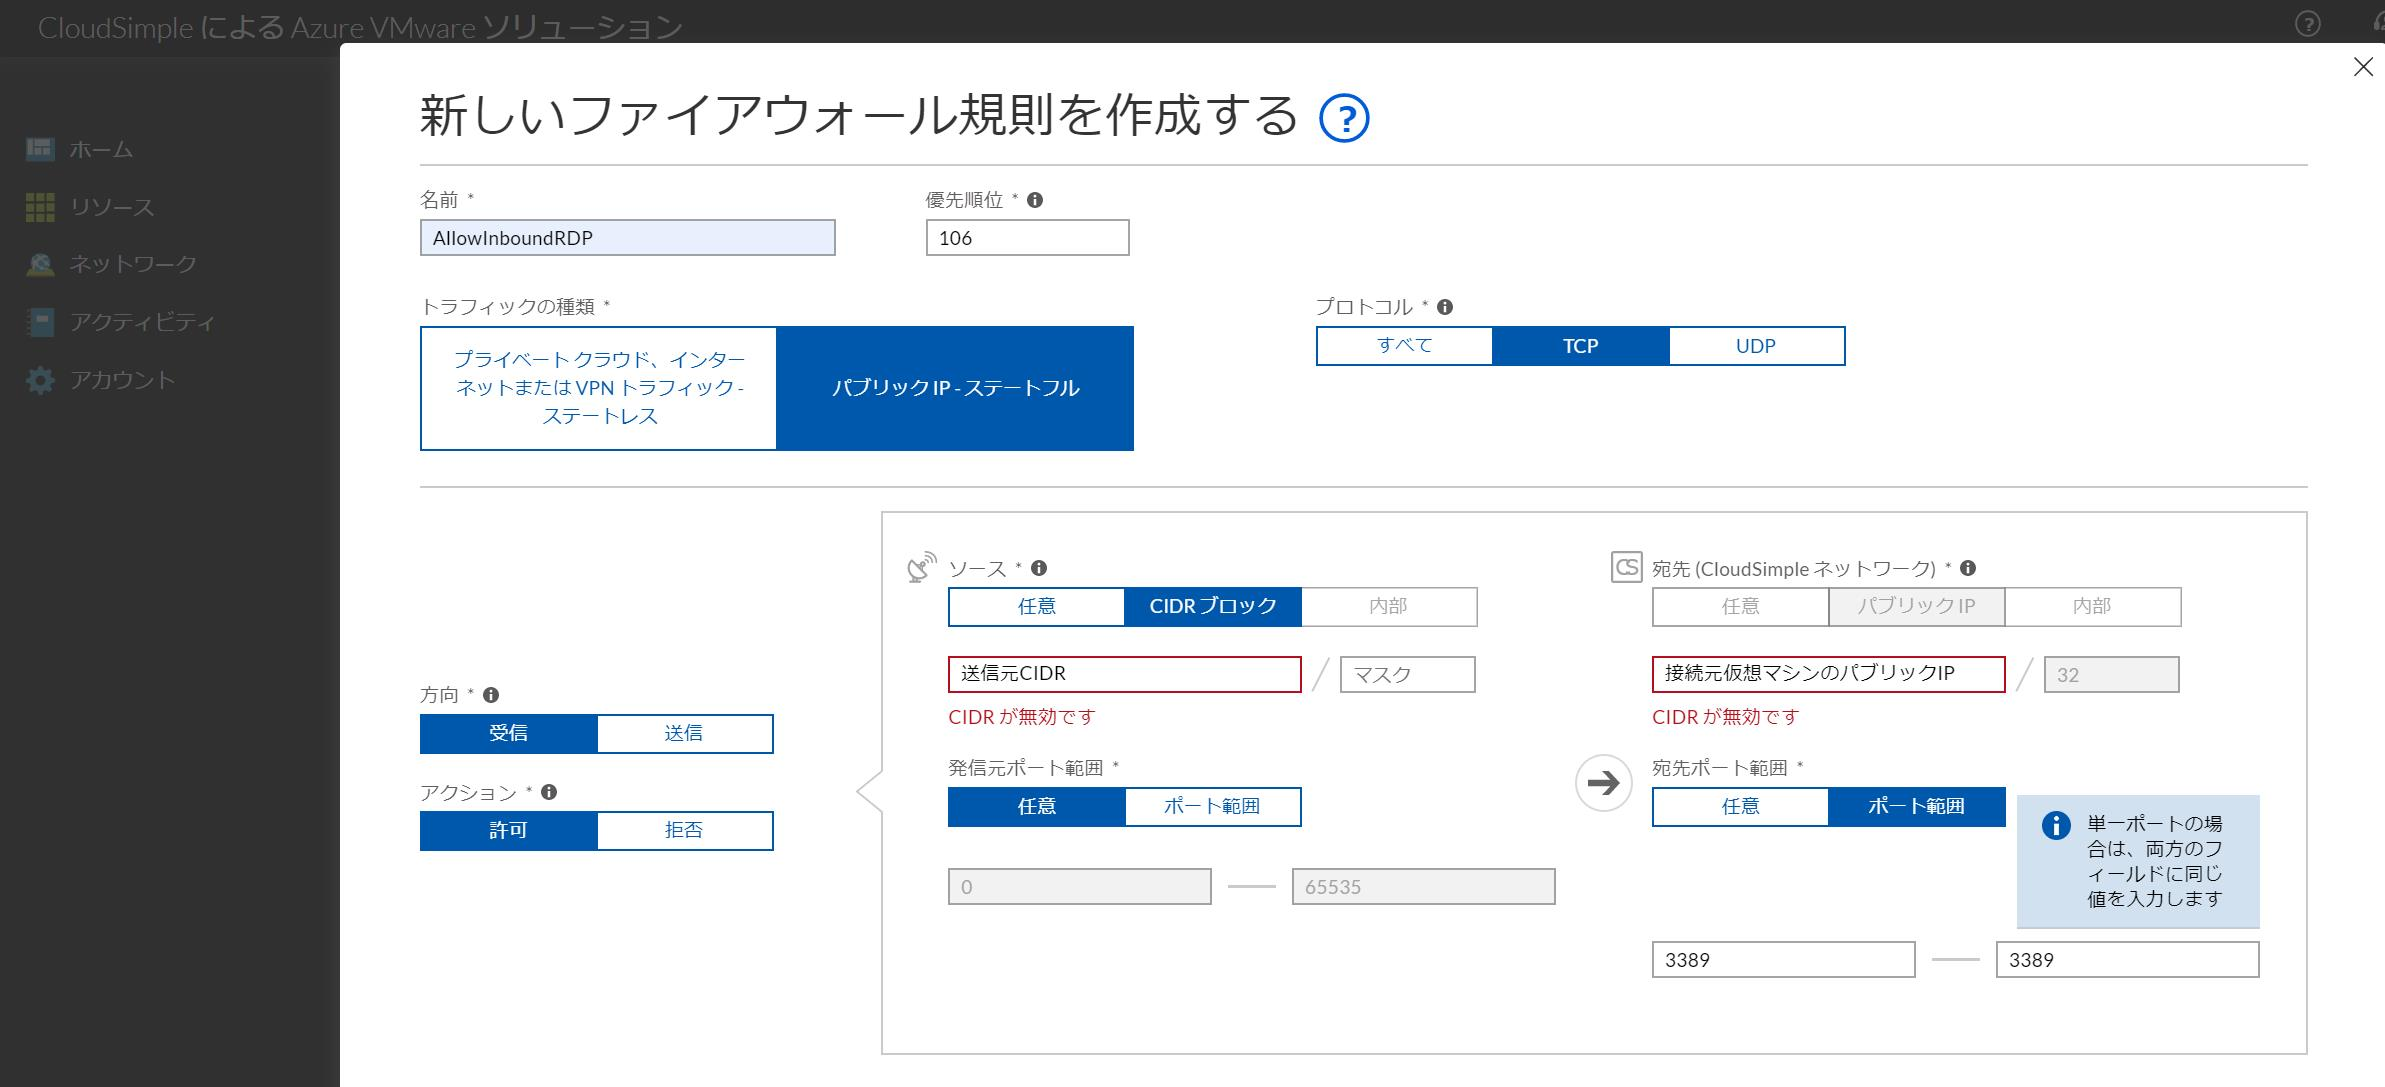 Azure VMware SolutionのCloudSimpleポータルのファイアウォールルール作成画面